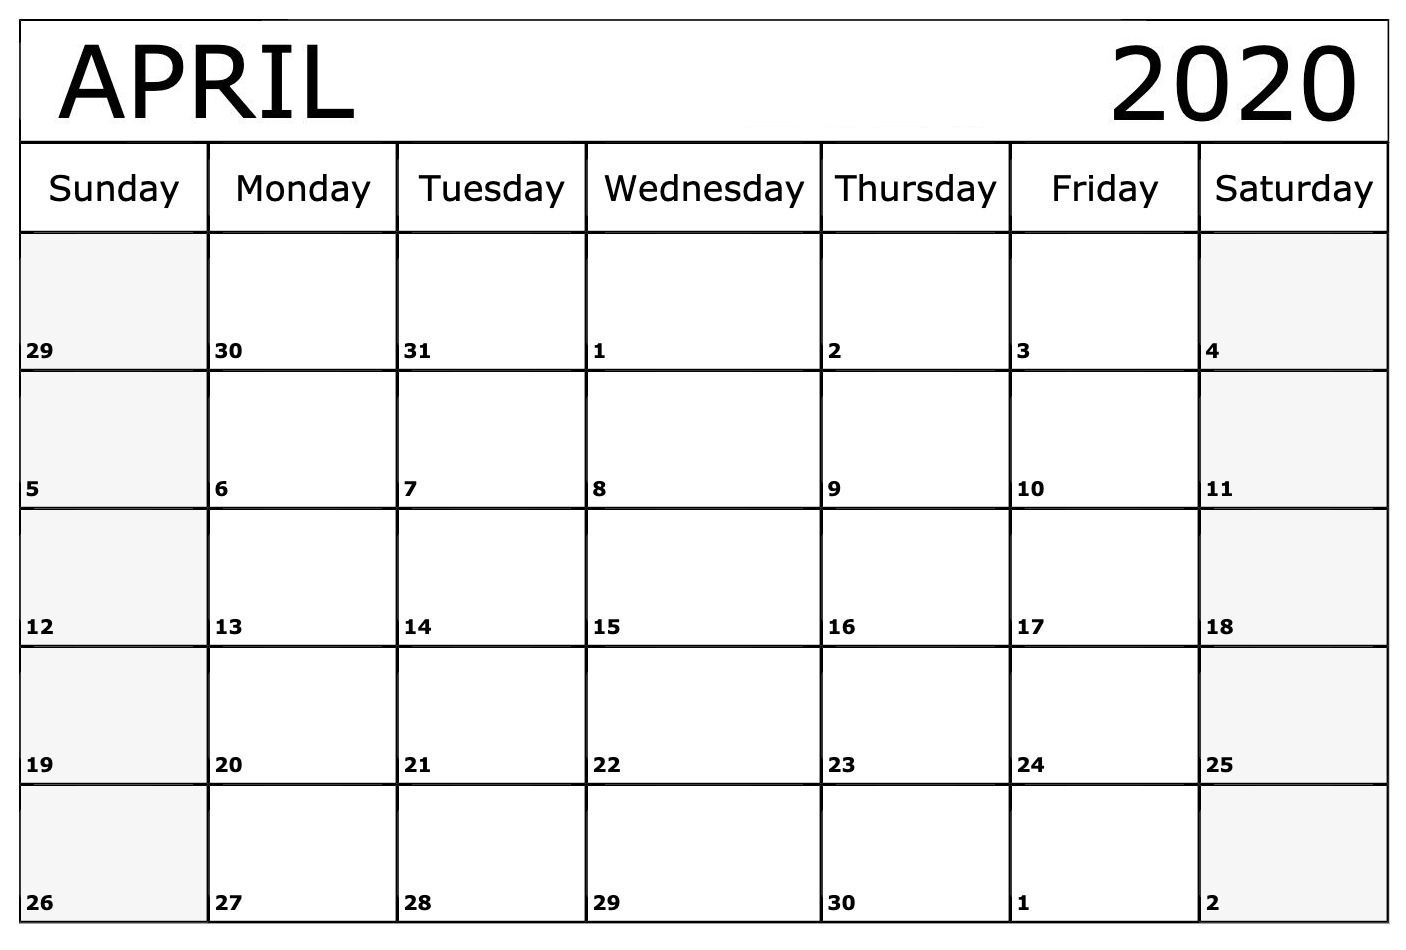 April 2020 Calendar Template Download